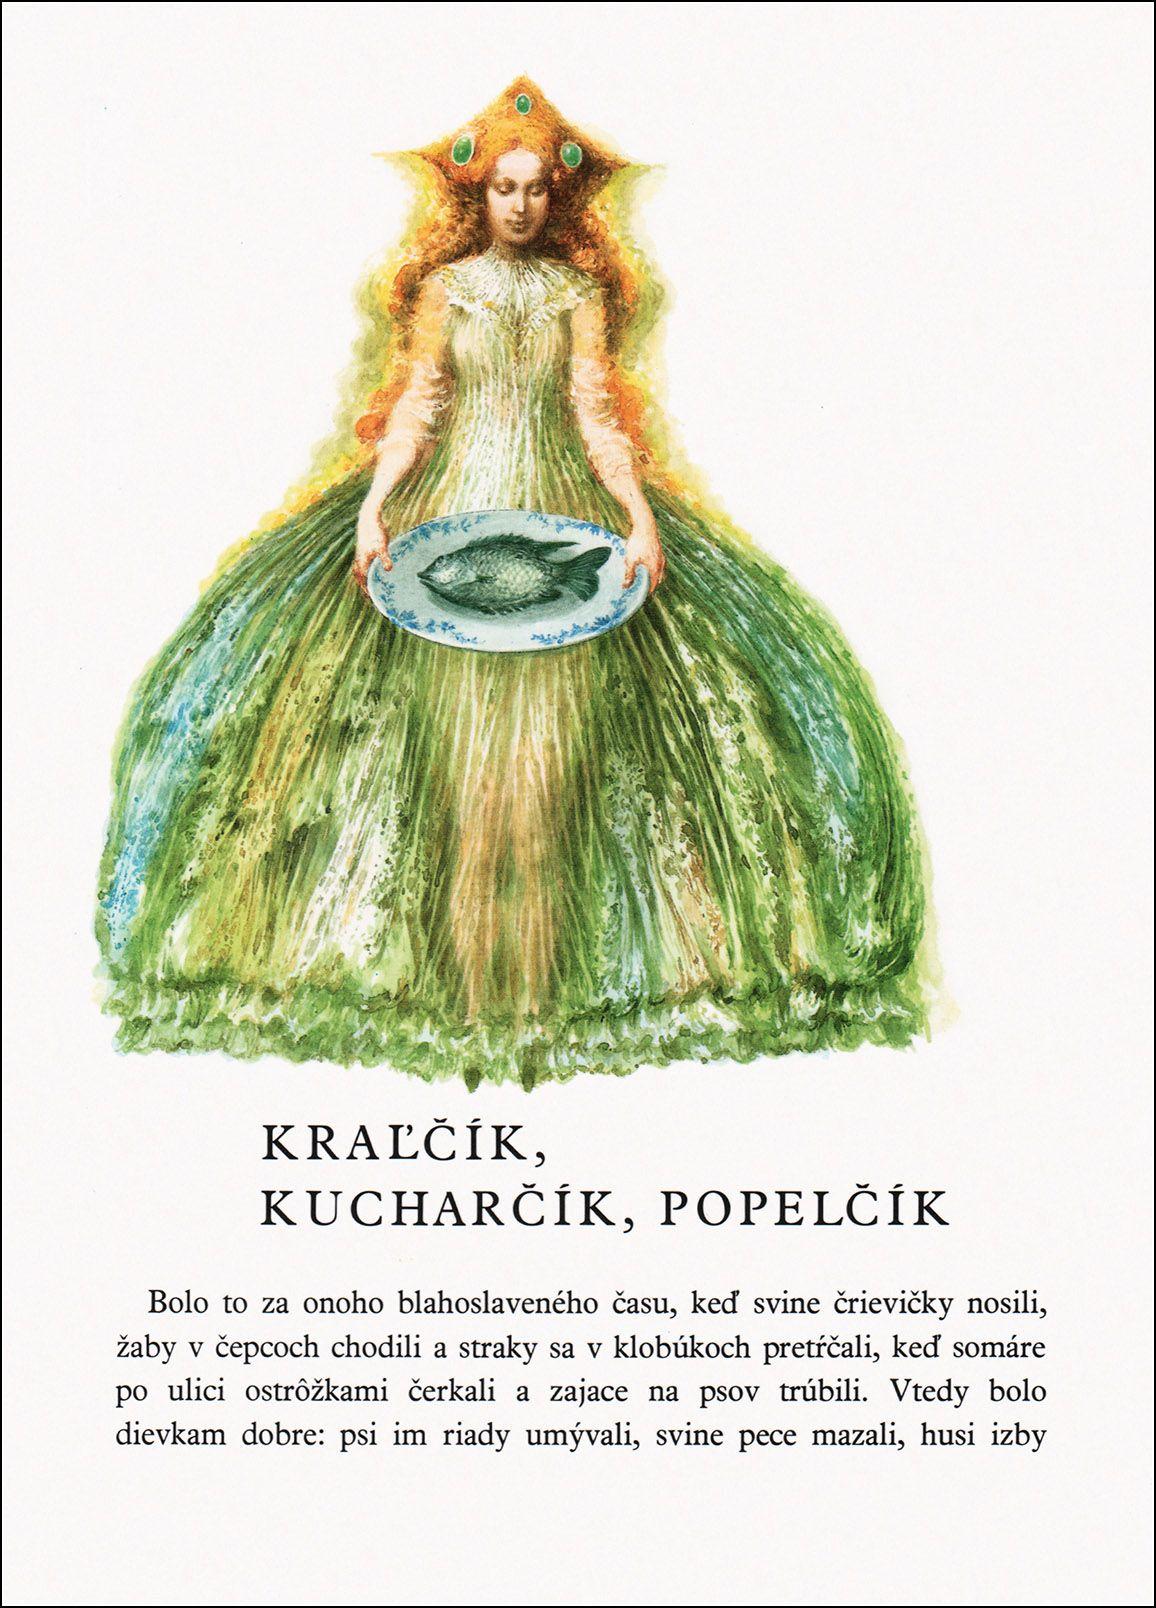 Slovenské rozprávky: tretia kniha zo zbierky Pavla Dobšinského.  Ilustroval národný umelec Albín Brunovský.